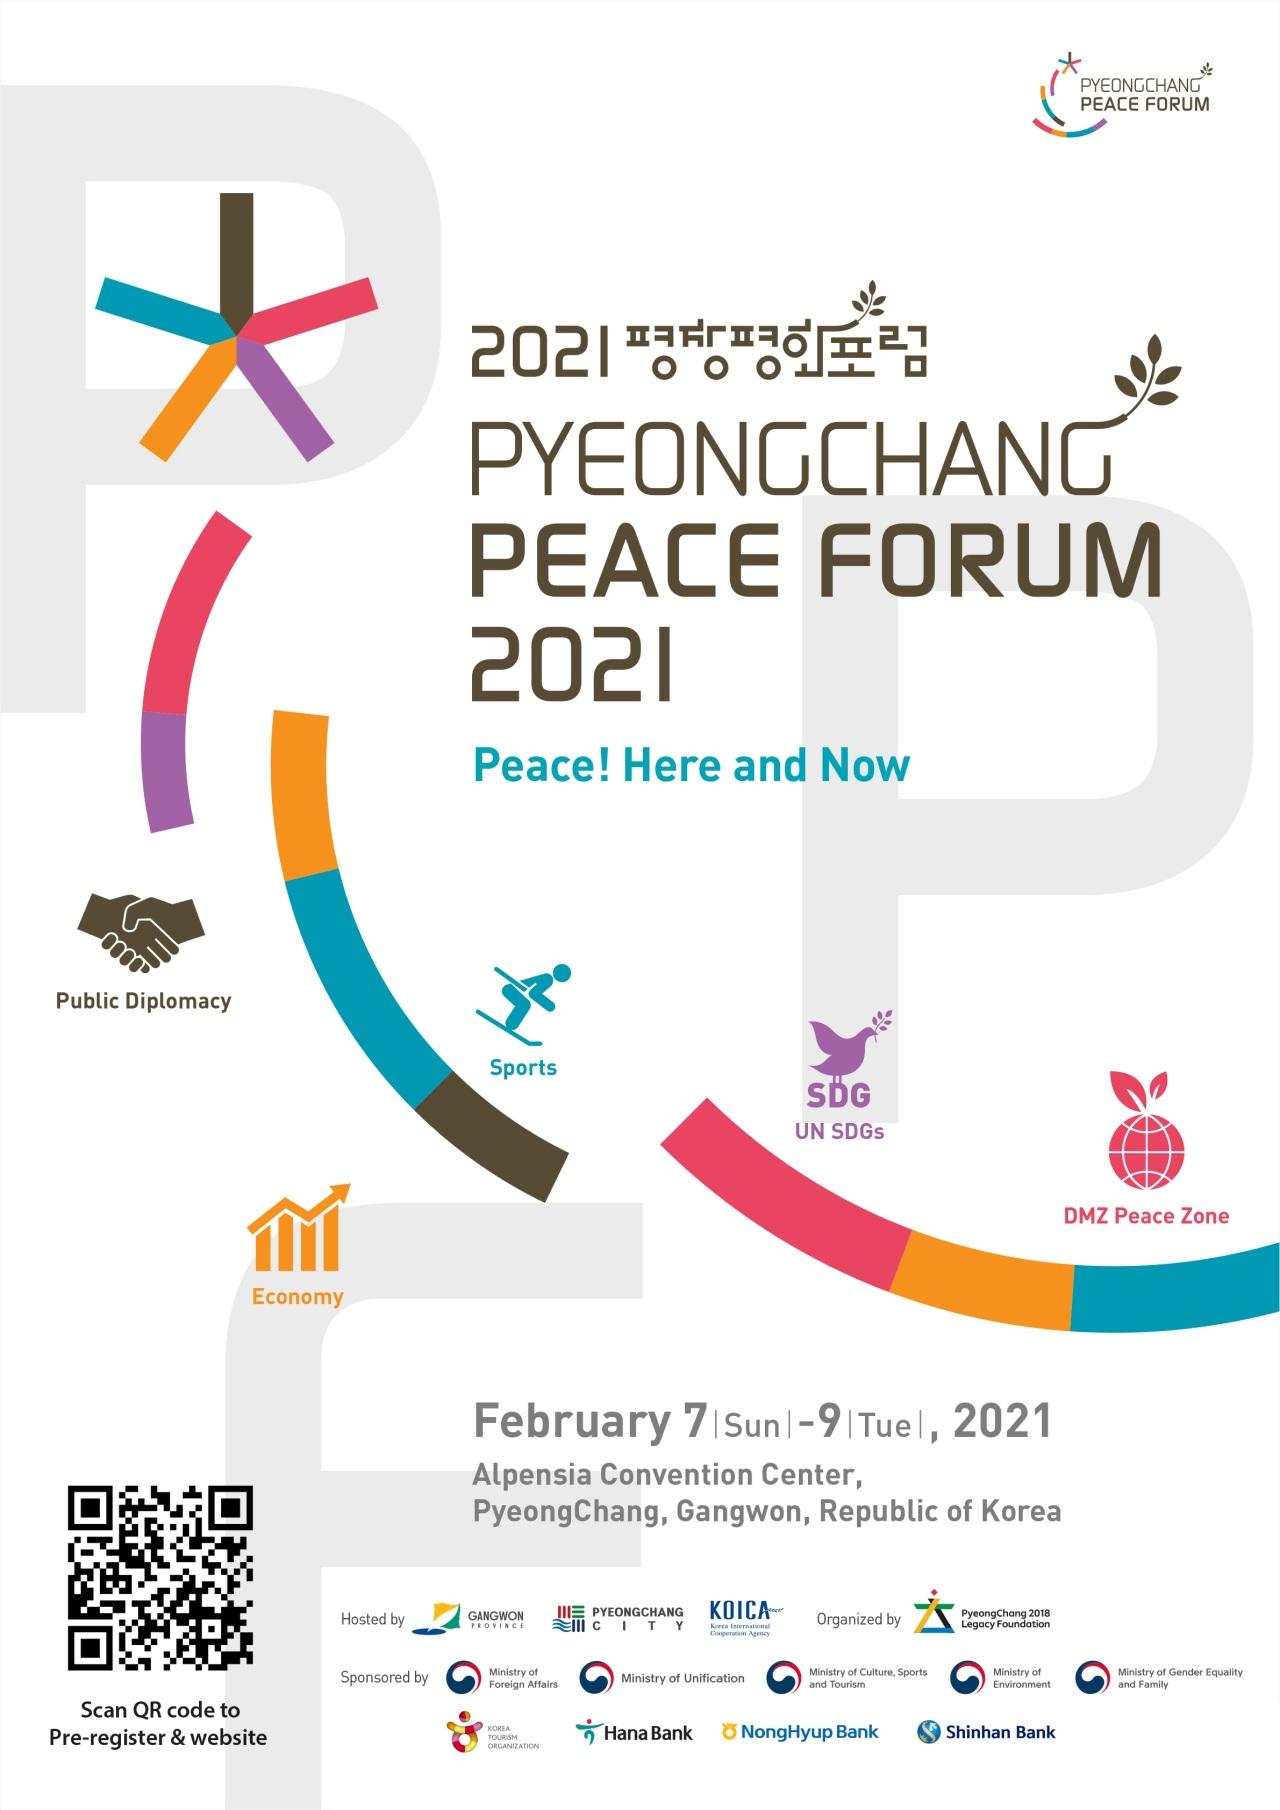 PyeongChang Peace Forum 2021